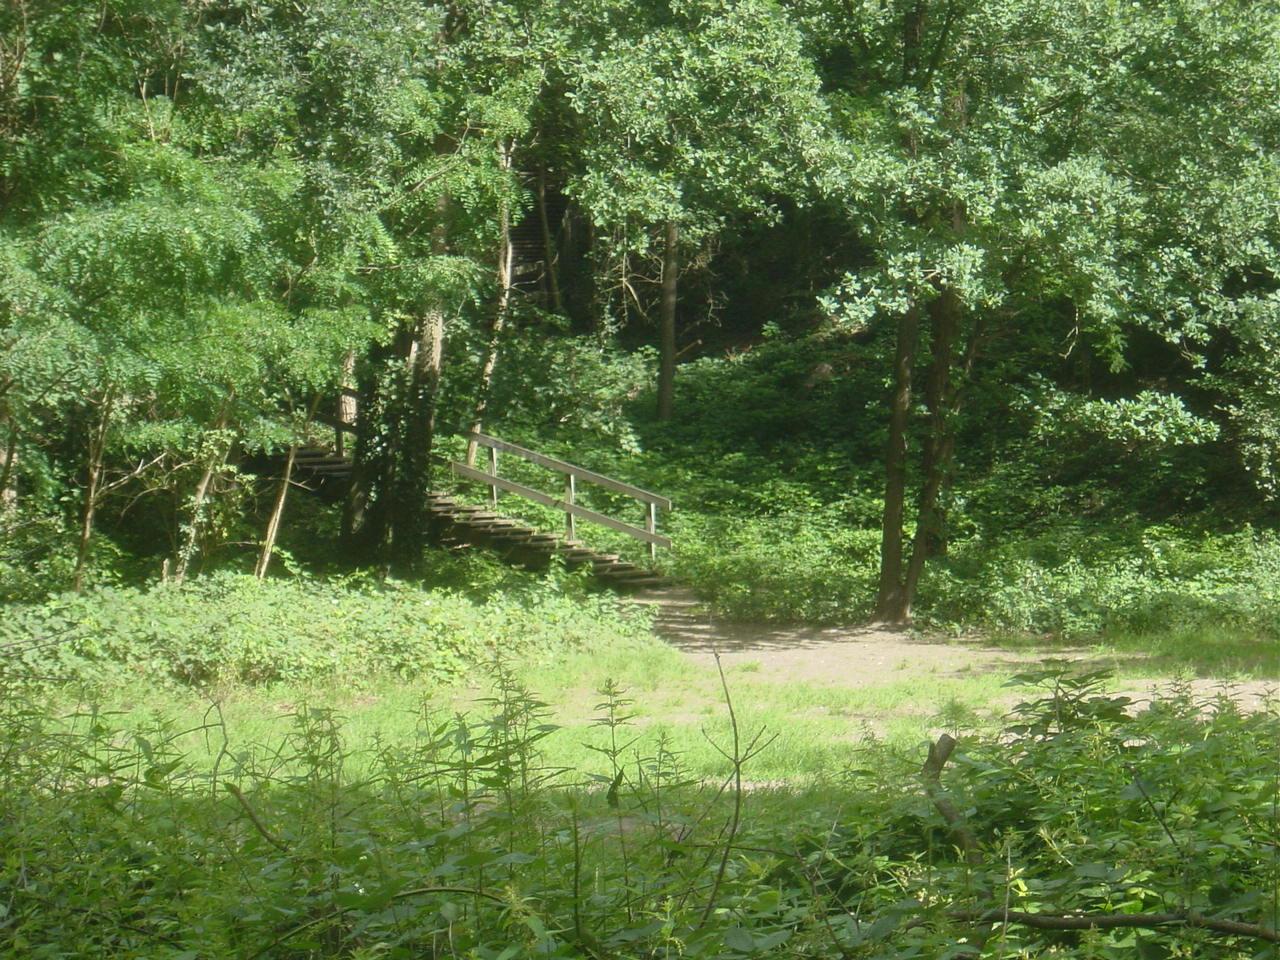 Ervaar groen in Oud West!